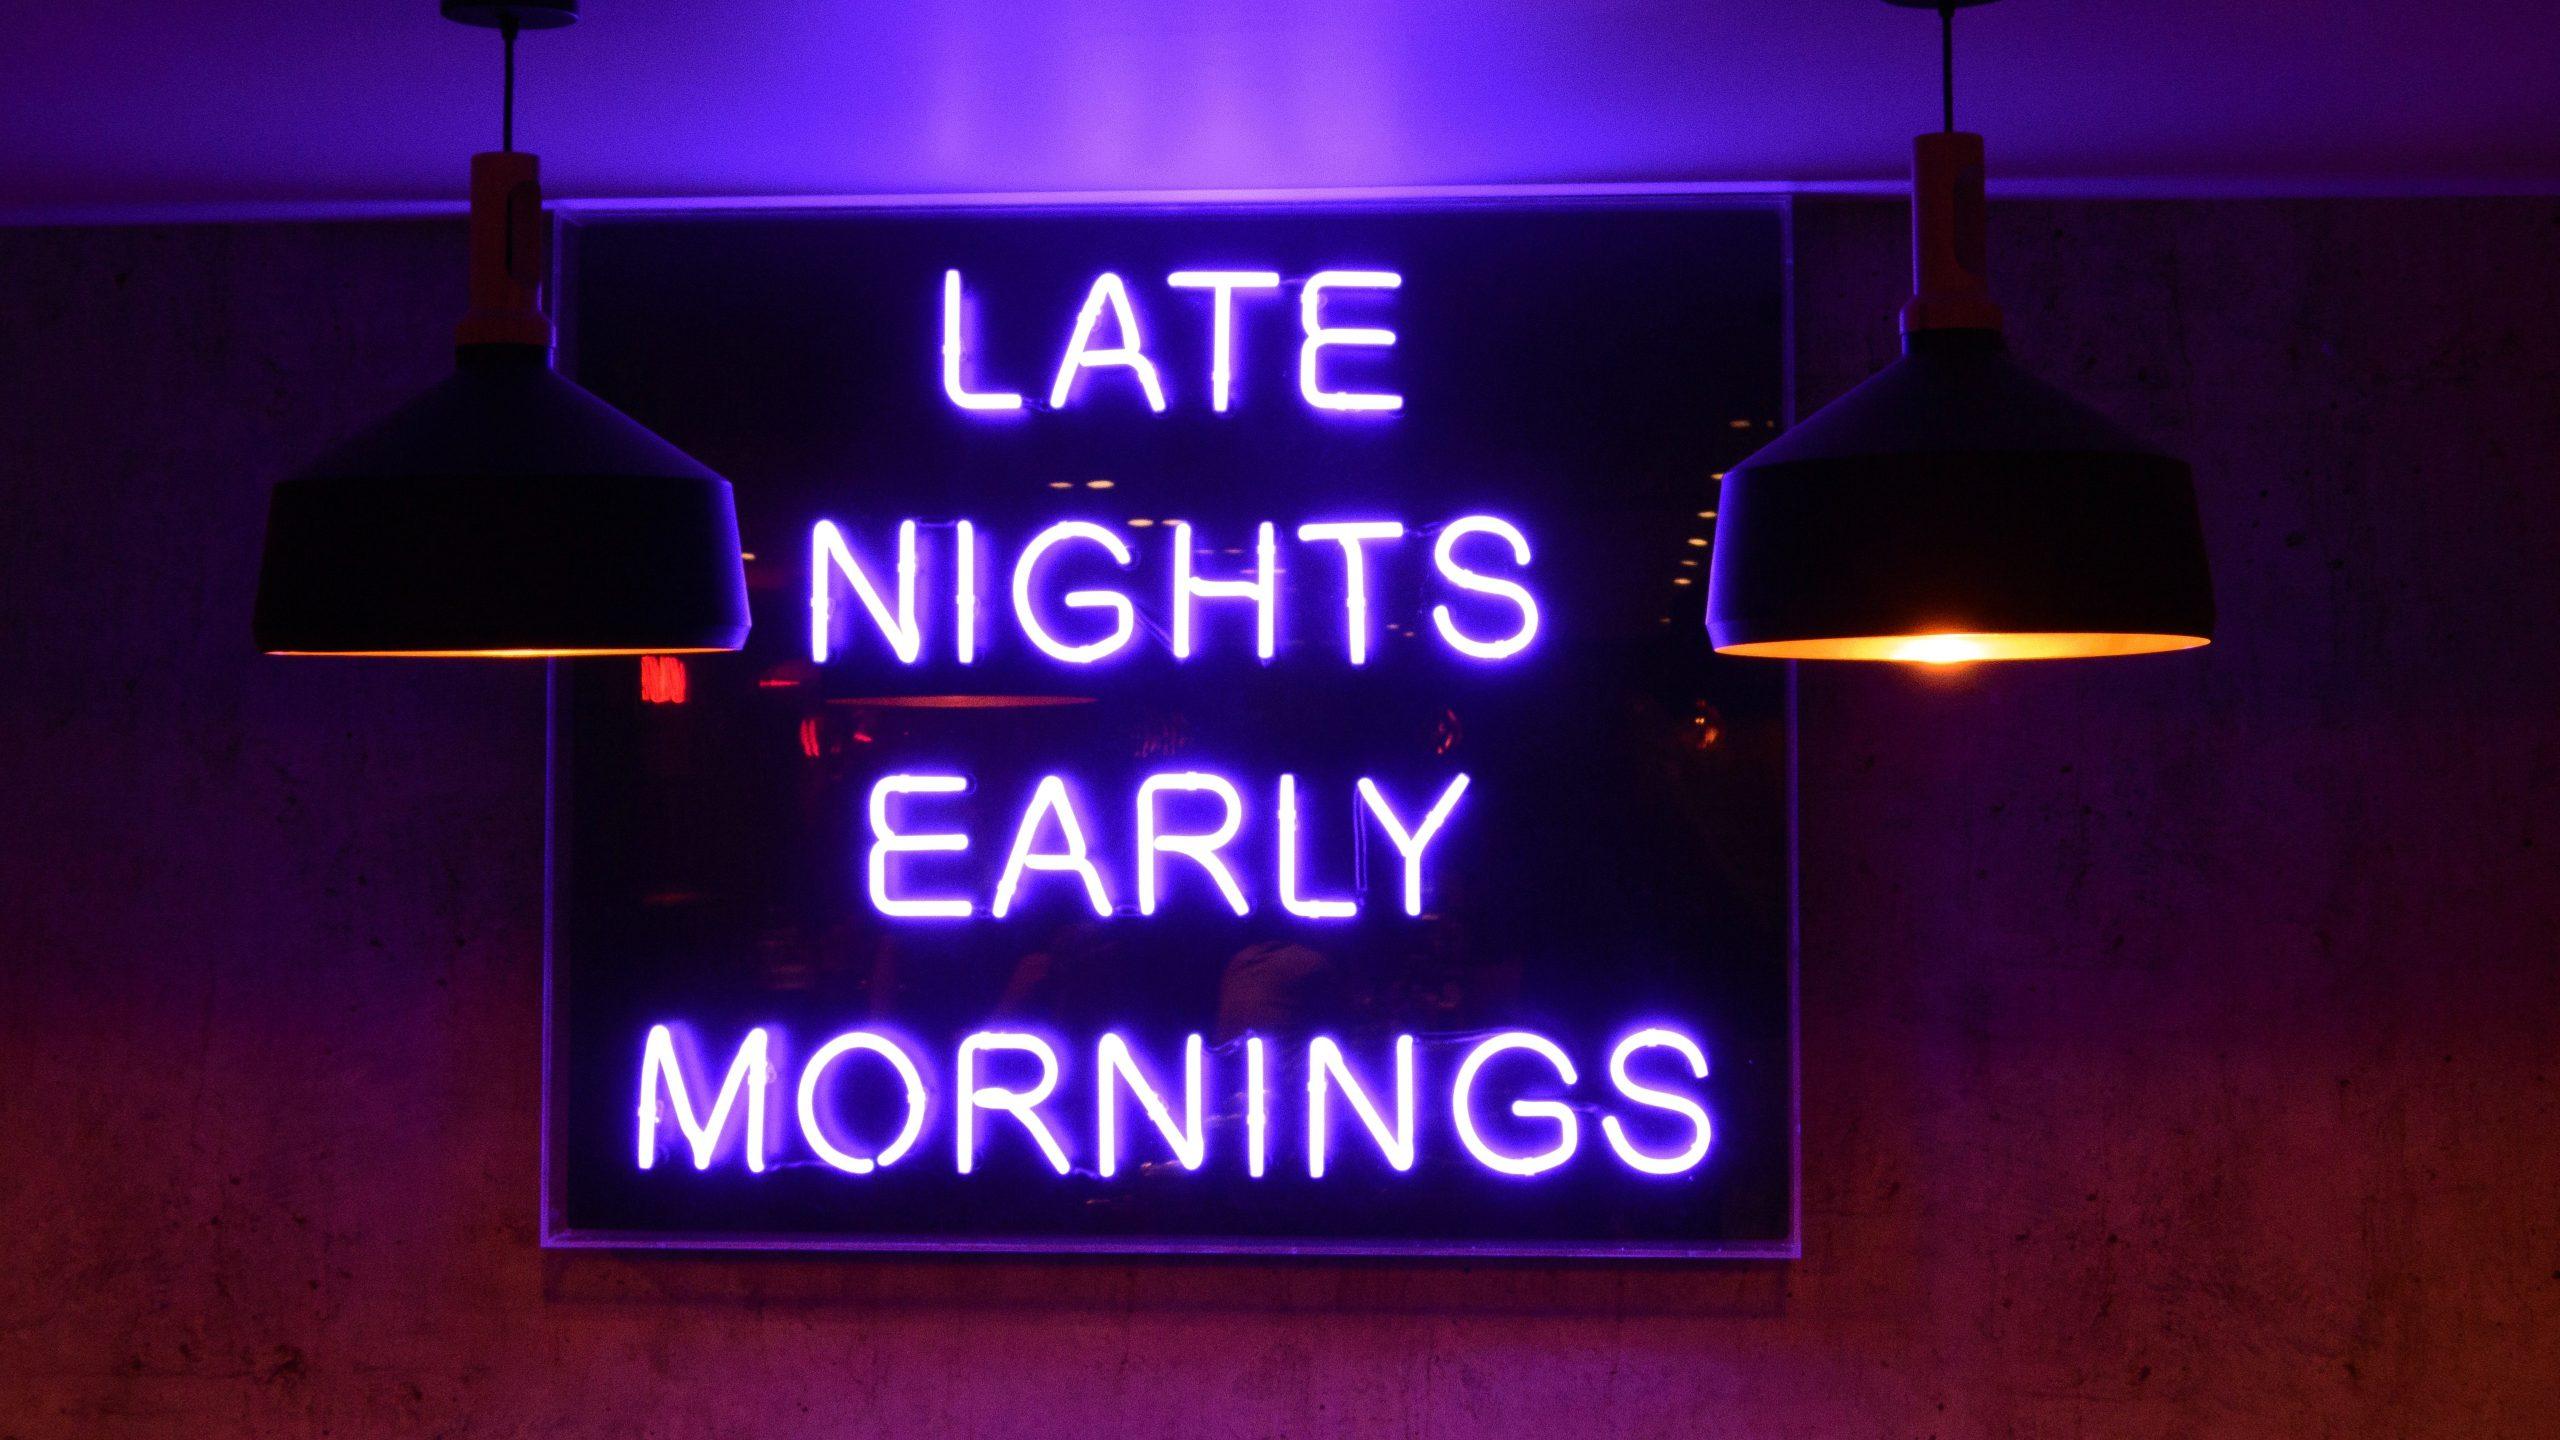 Wbtb late nights